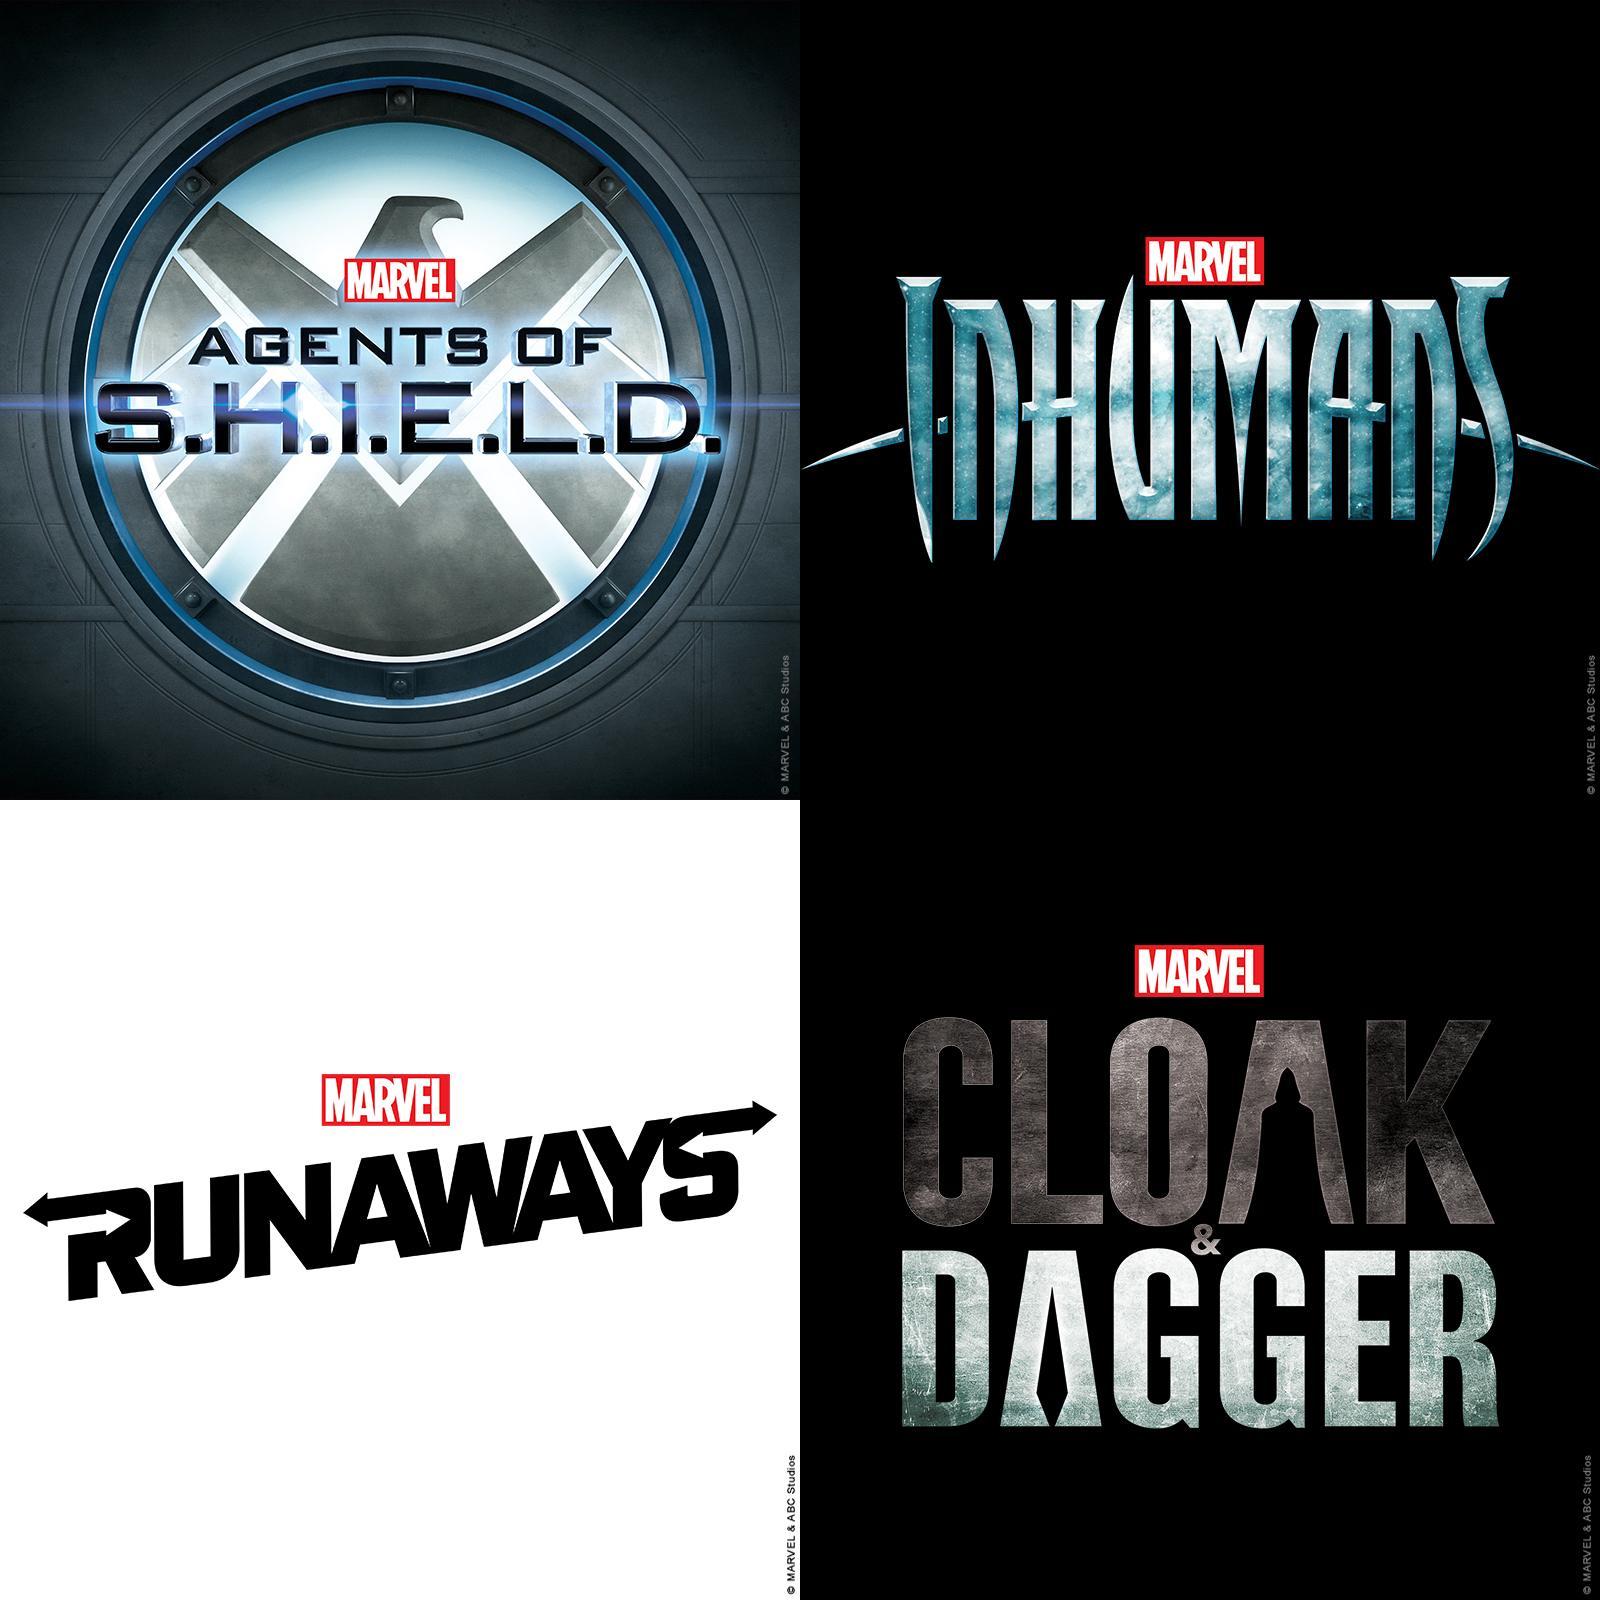 Seriale Marvel na Showmax